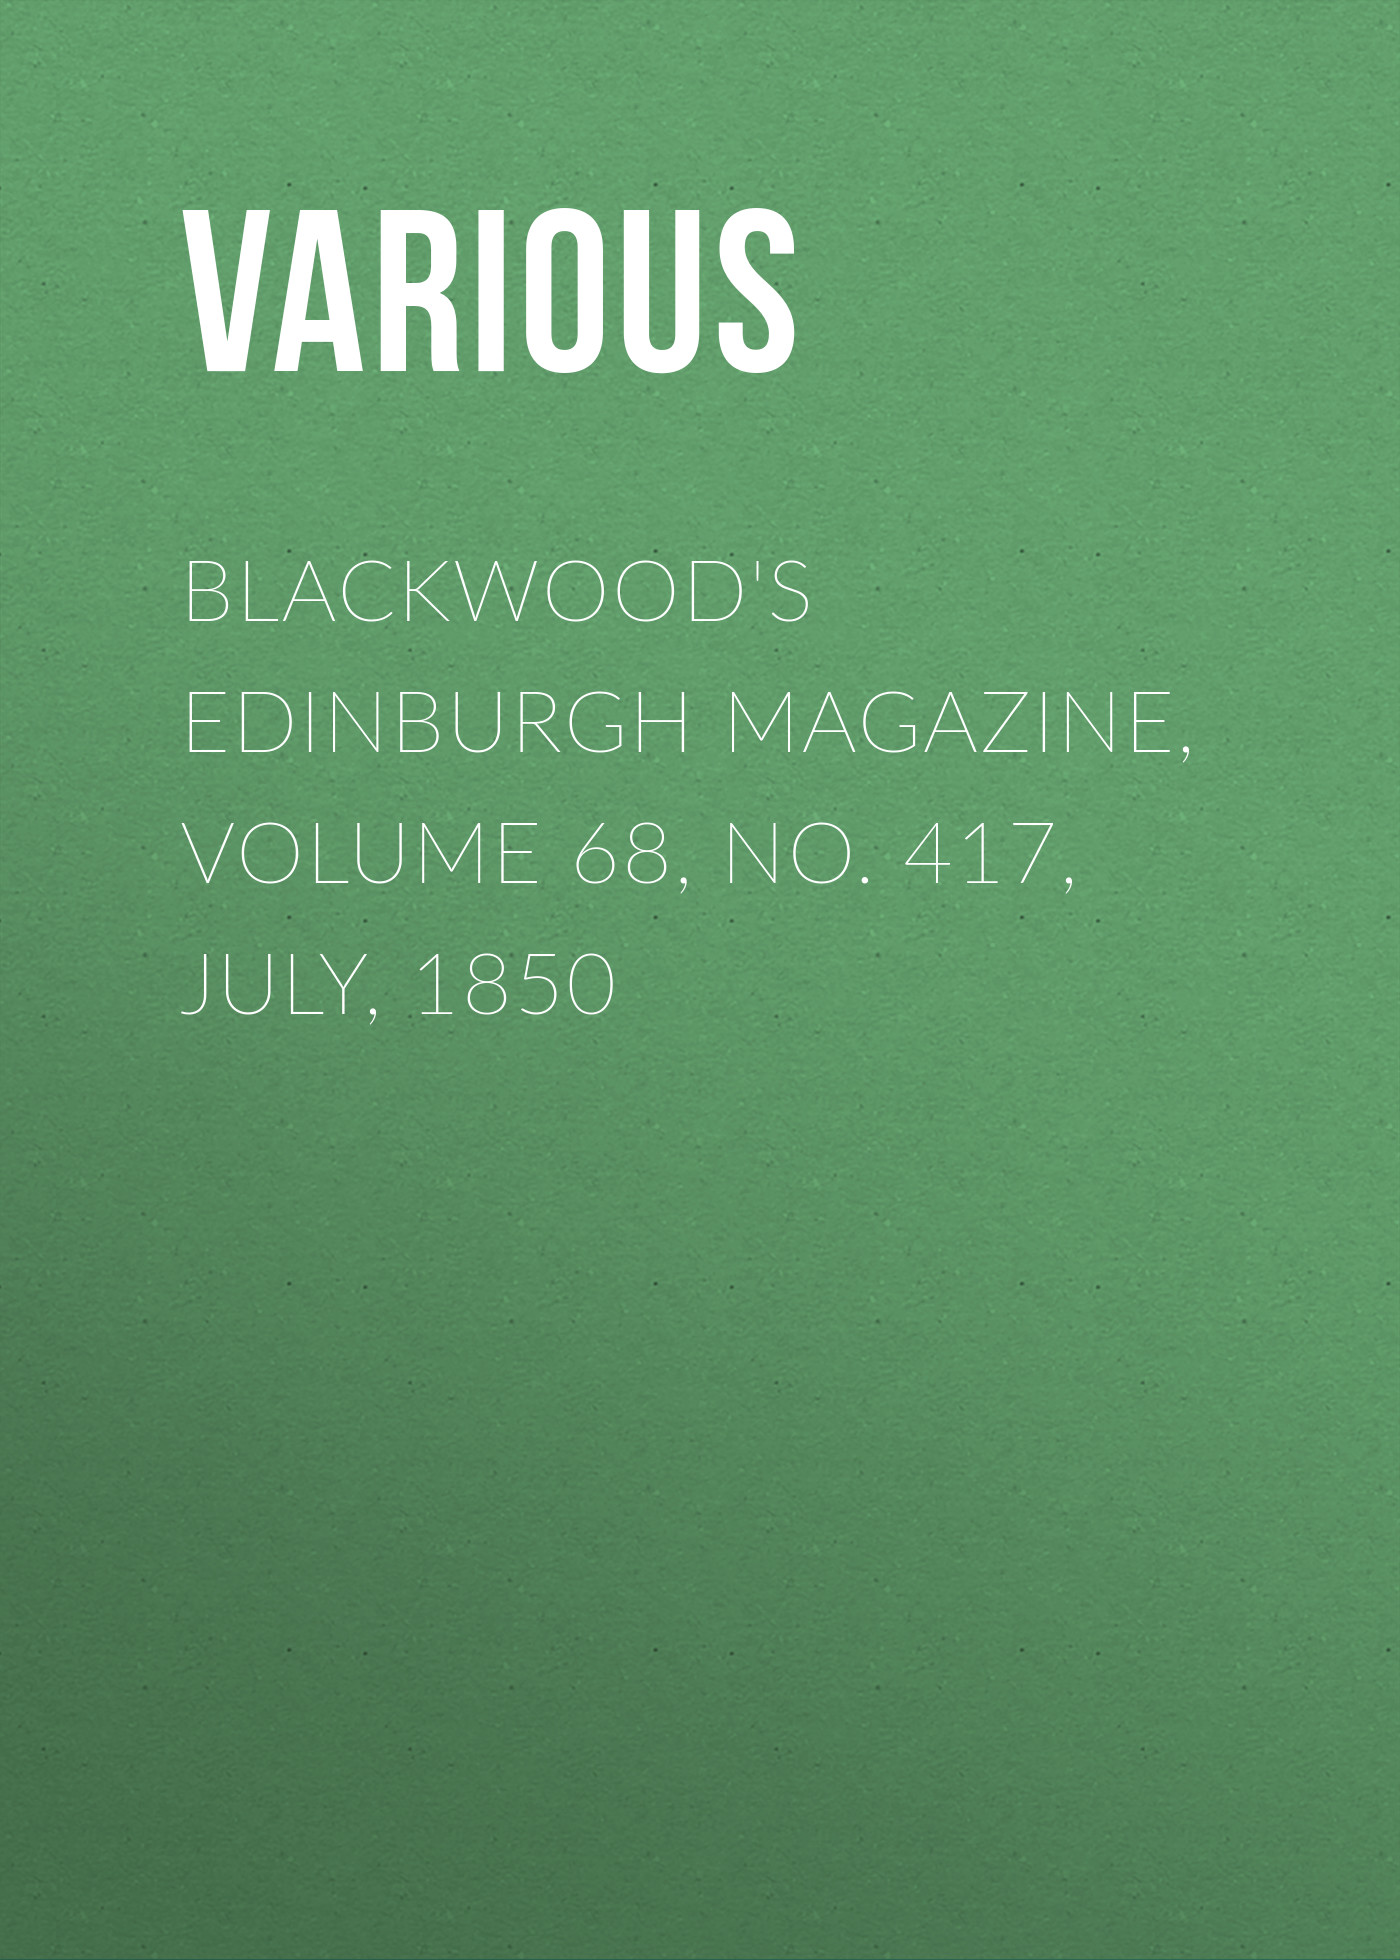 Various Blackwood's Edinburgh Magazine, Volume 68, No. 417, July, 1850 various harper s new monthly magazine volume 1 no 2 july 1850